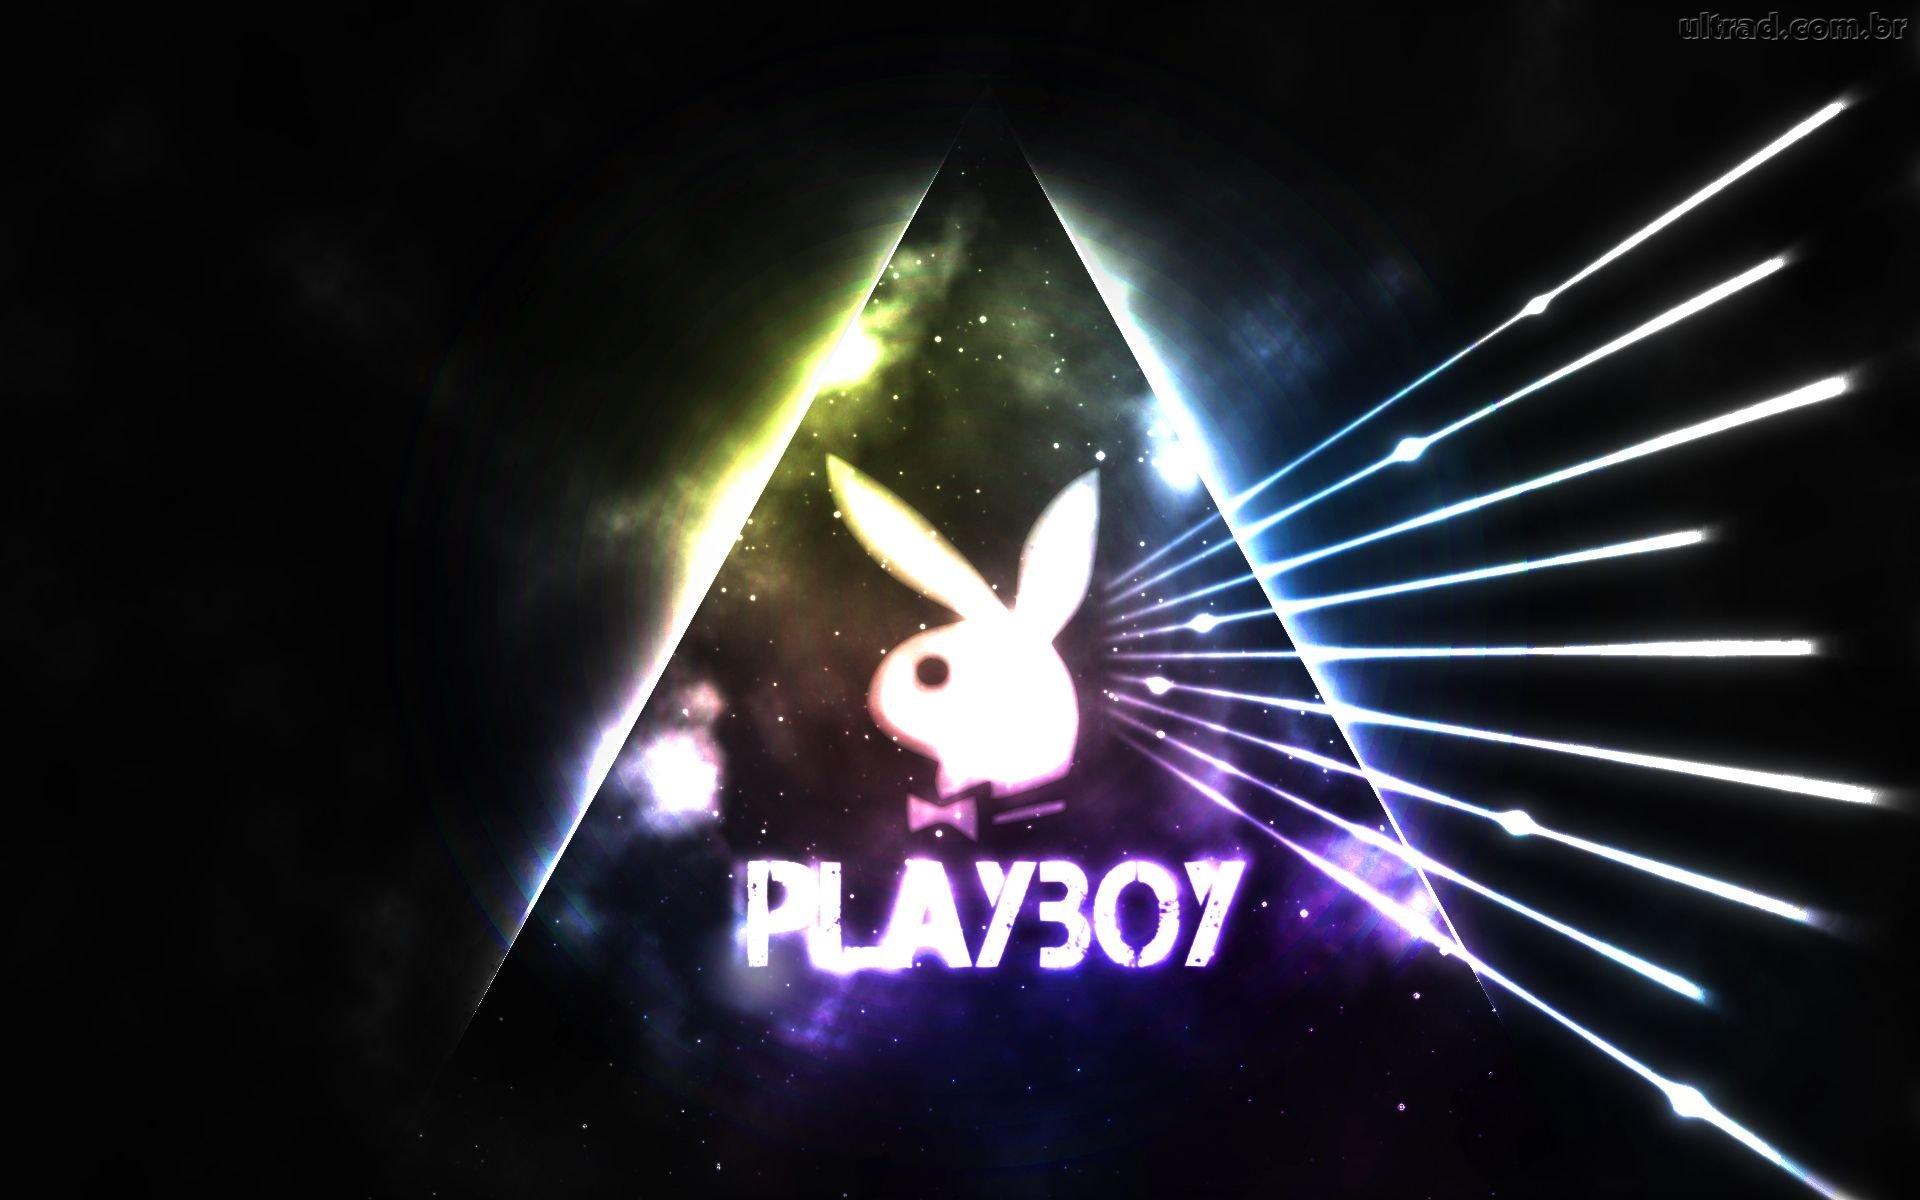 PLAYBOY Adult Logo Poster 5 Wallpaper